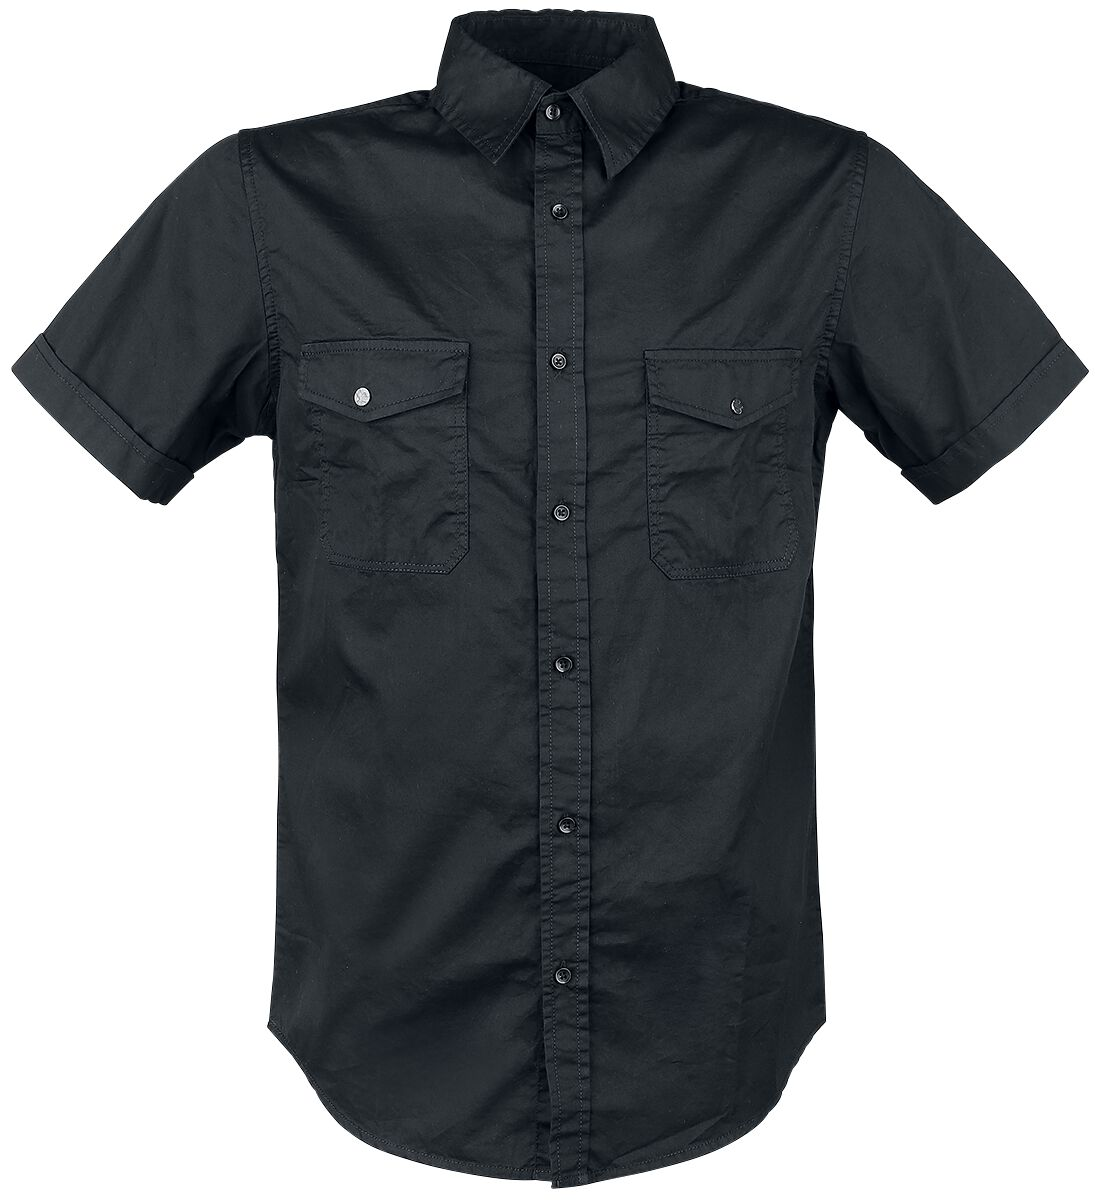 Image of   Black Premium by EMP Basic Shortsleeve Shirt Skjorte sort